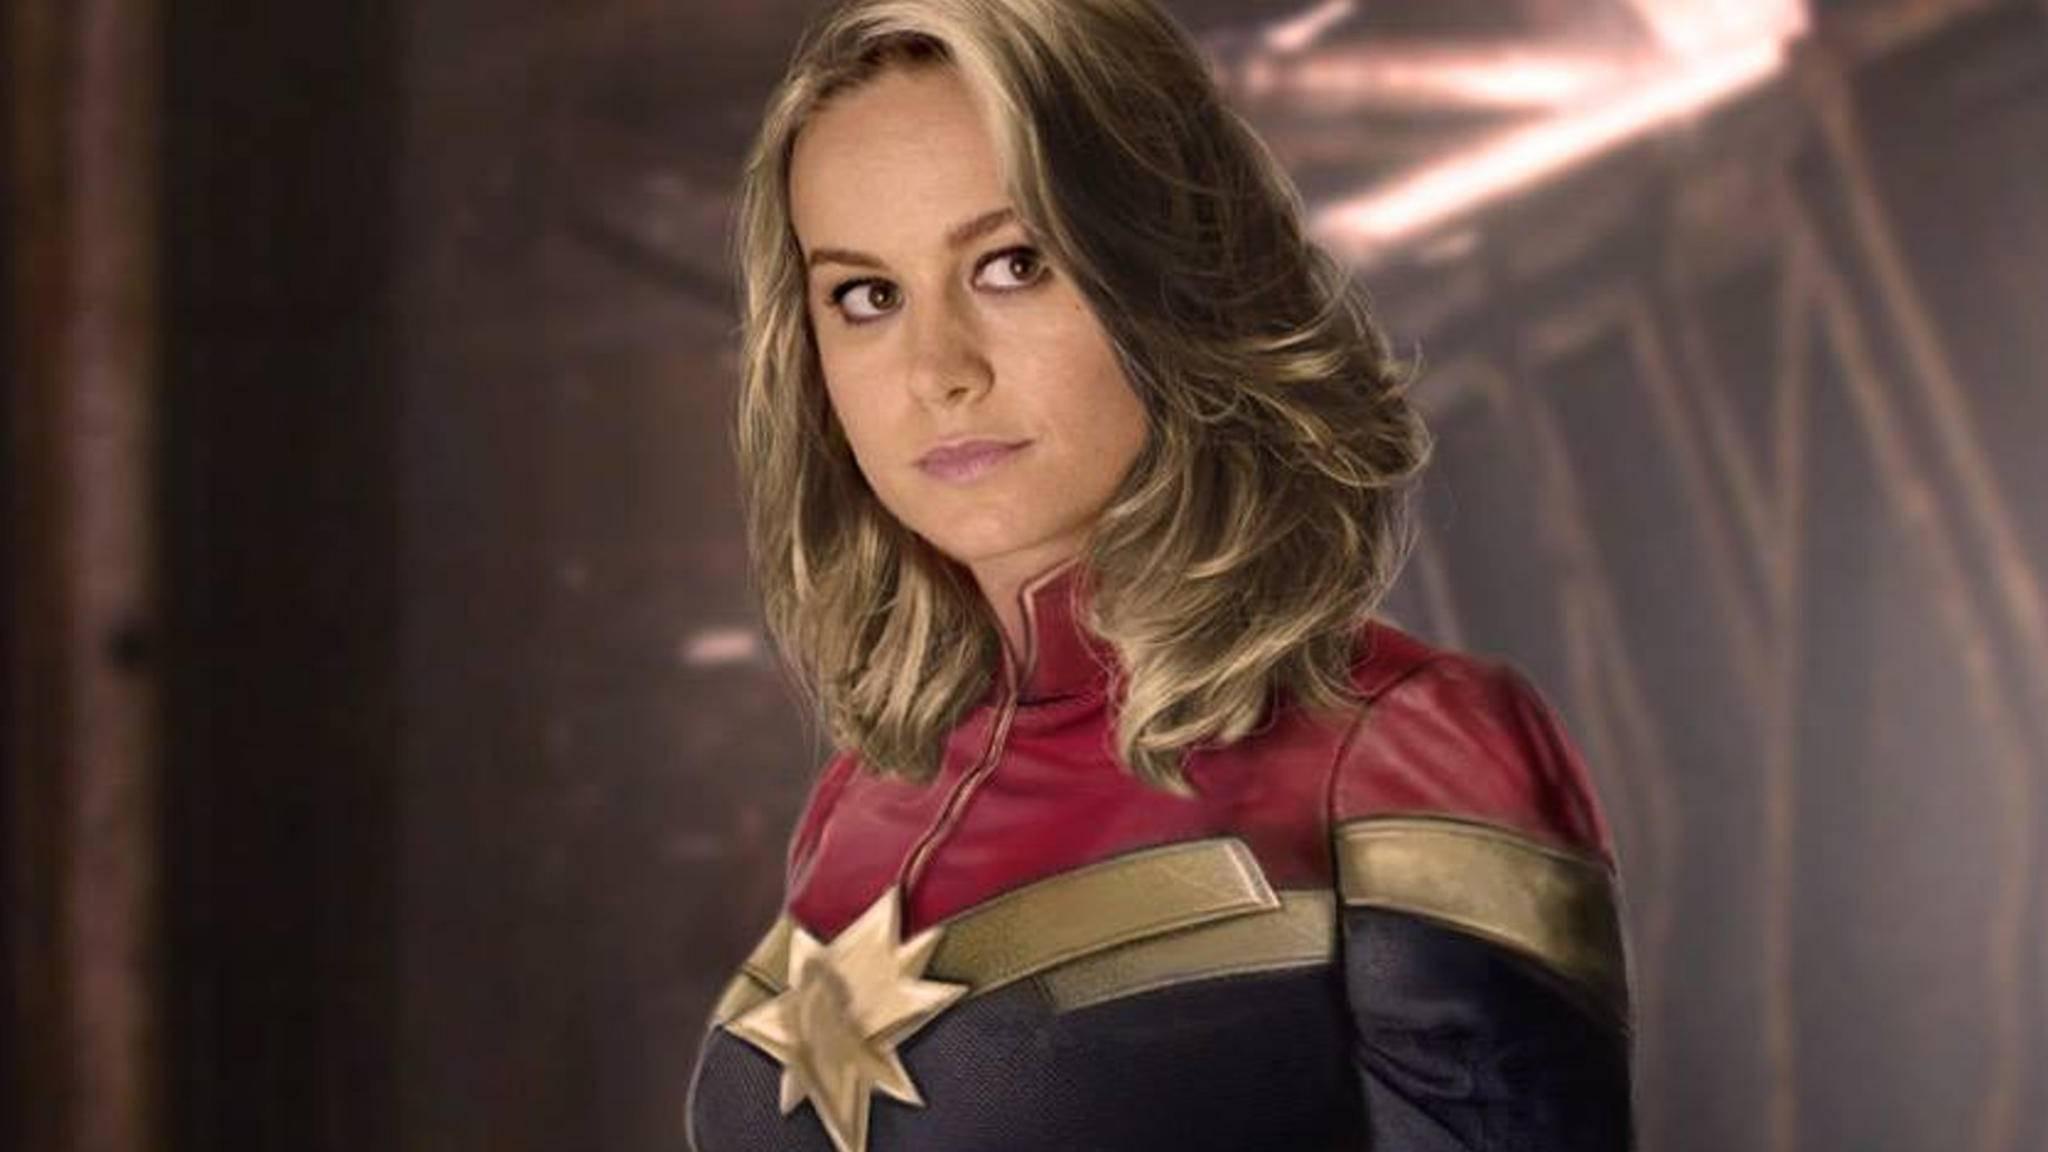 Eilt Captain Marvel zur Hilfe?